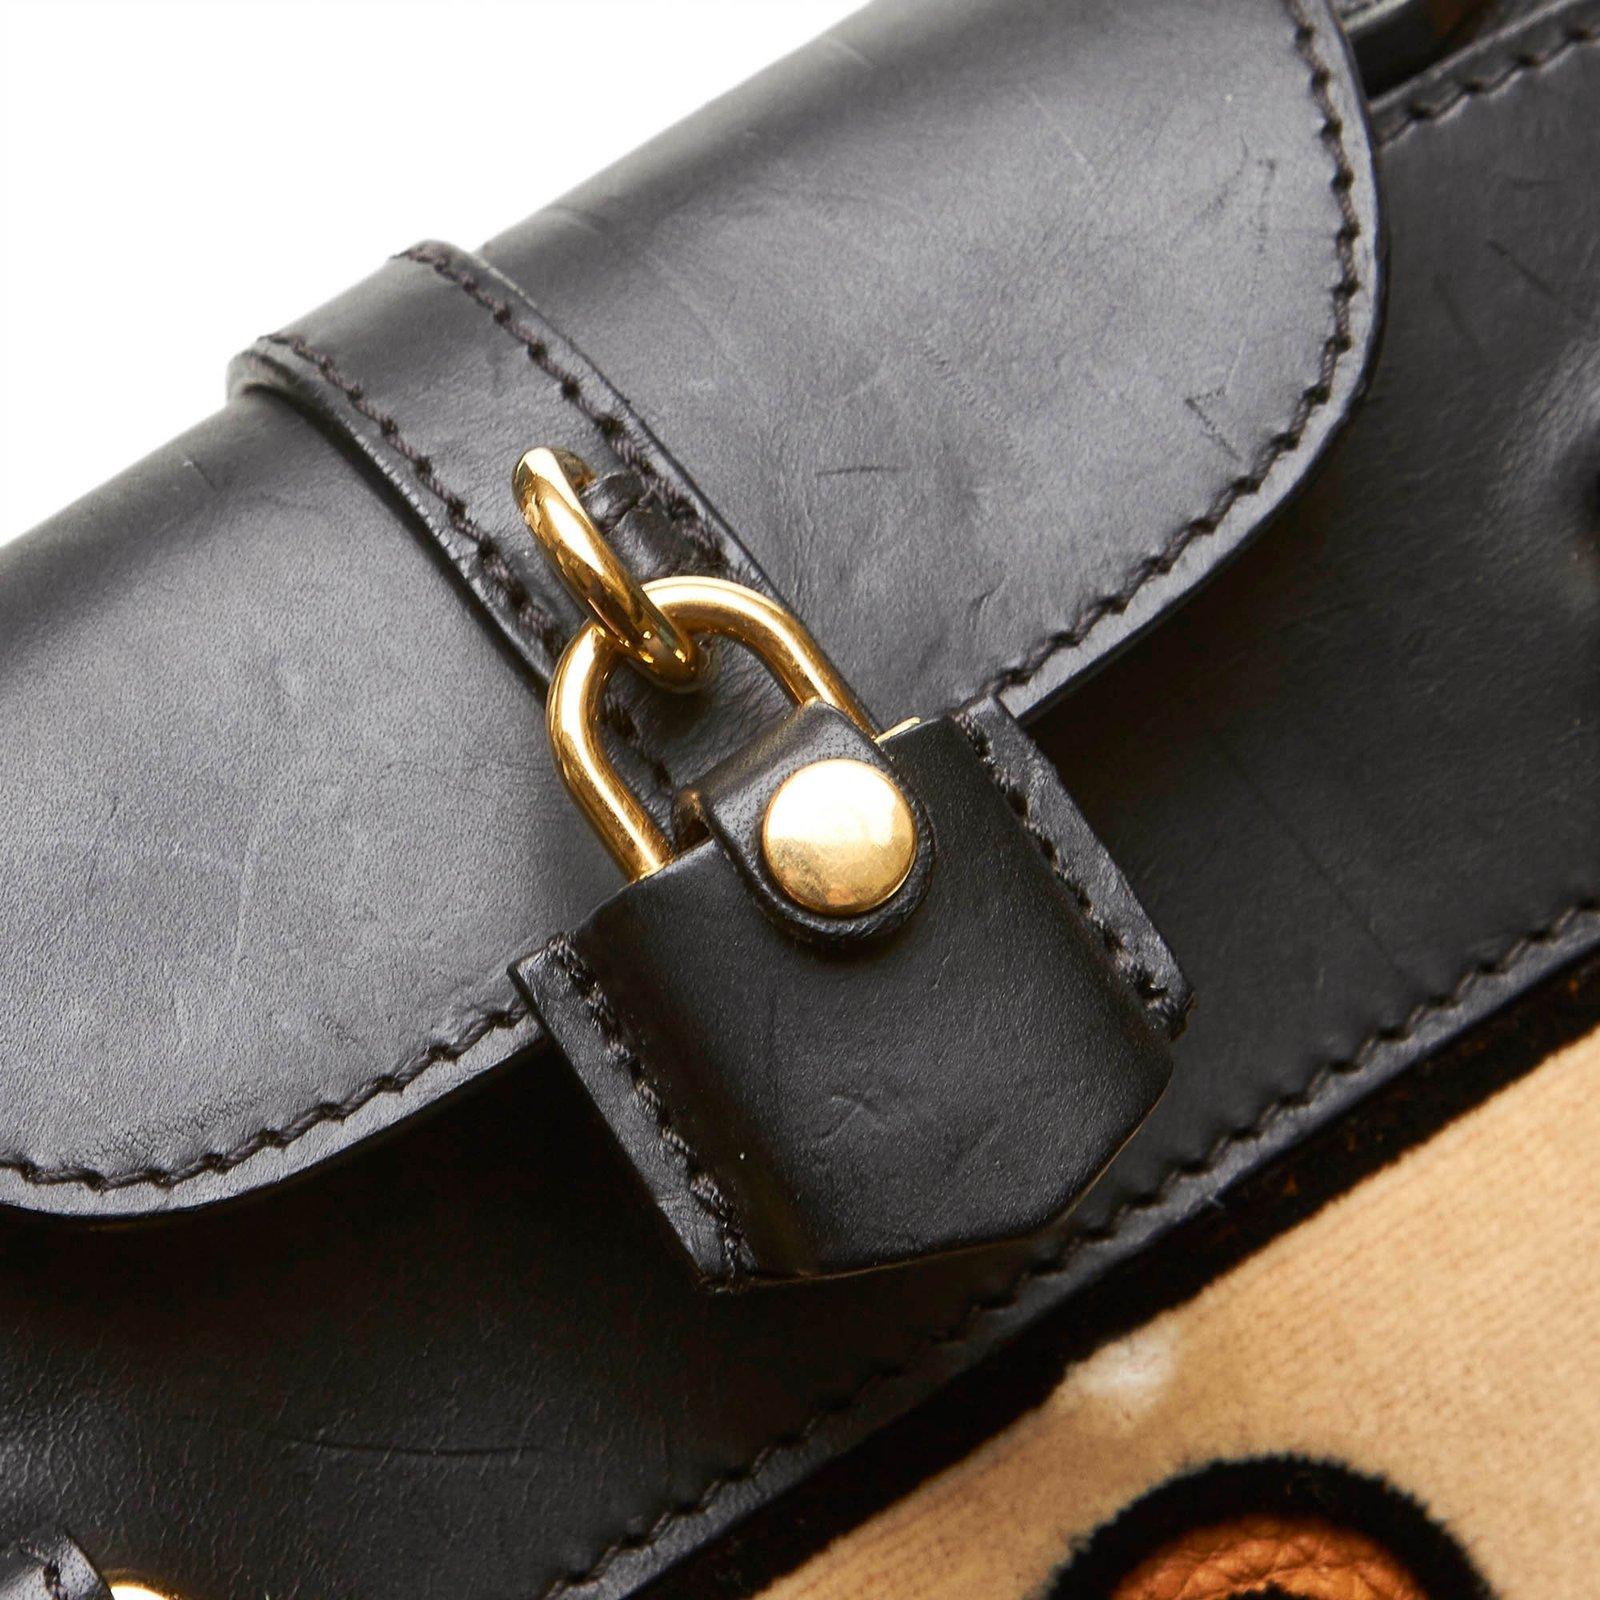 Burberry Milverton Satchel Handbags Leather,Other,Velvet,Cloth Black,Orange  ref.101099 - Joli Closet 467718b4db